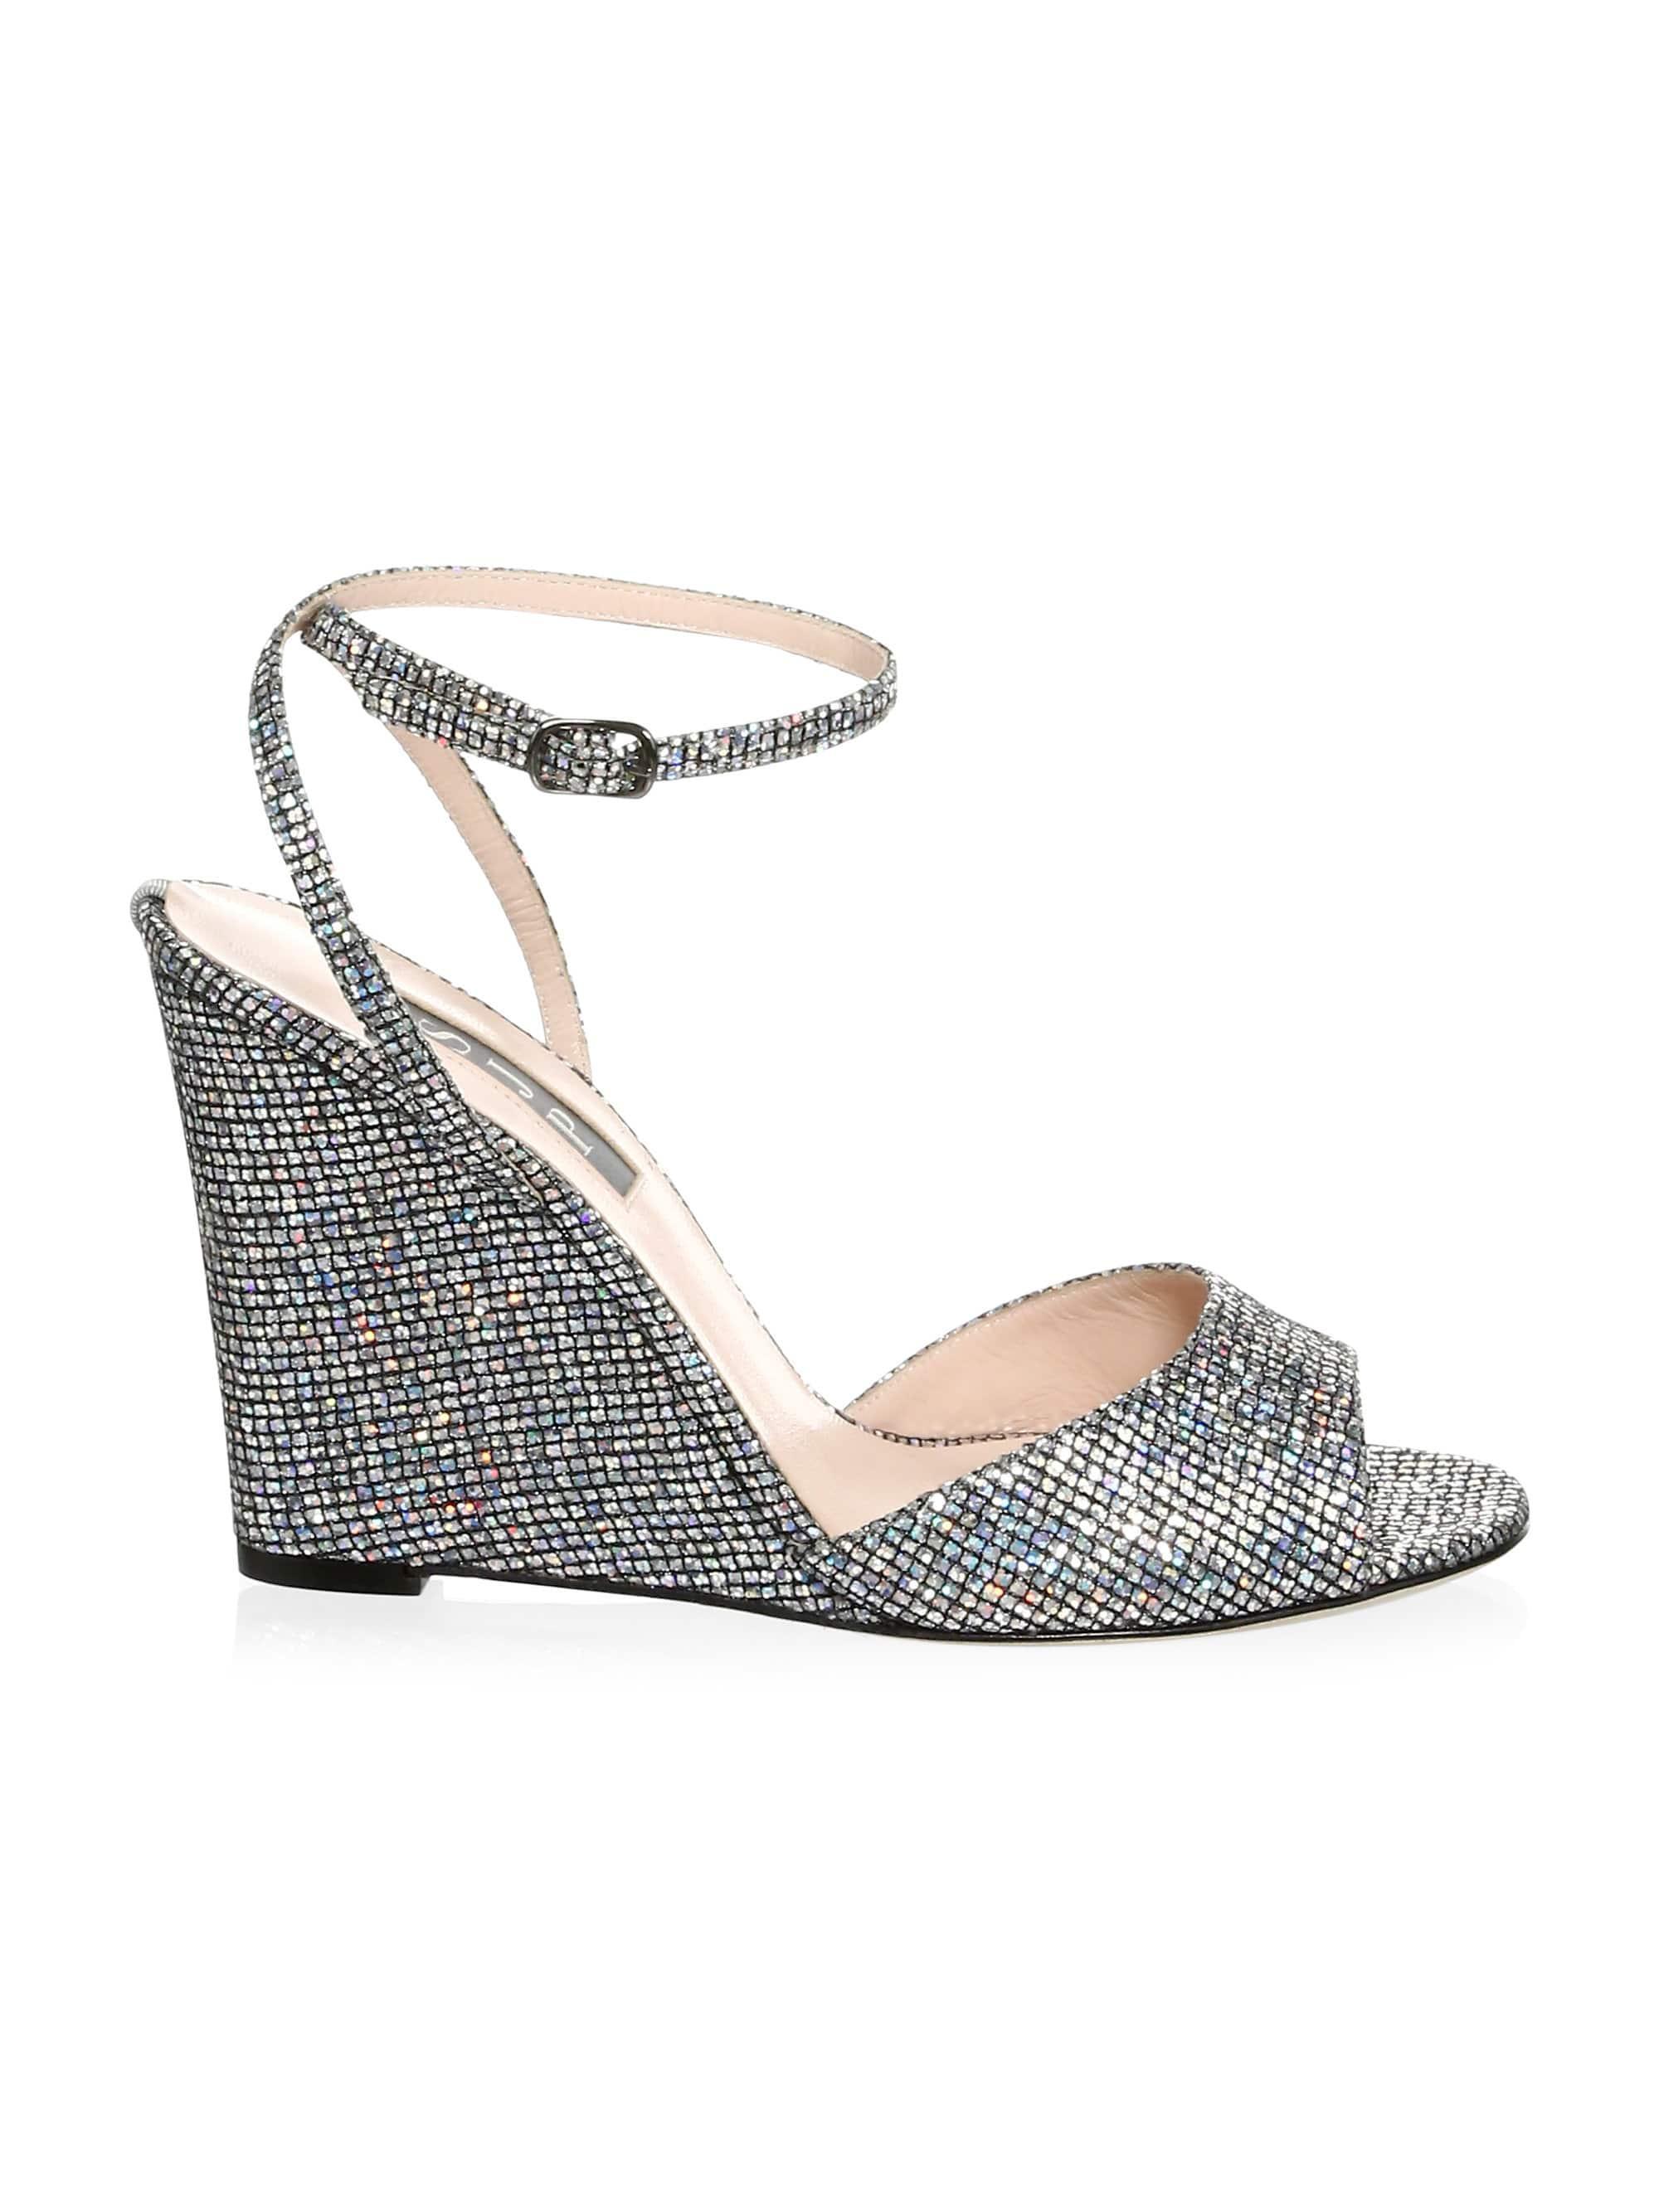 f6b0224c11 SJP by Sarah Jessica Parker Boca Glitter Wedge Sandals in Metallic - Lyst